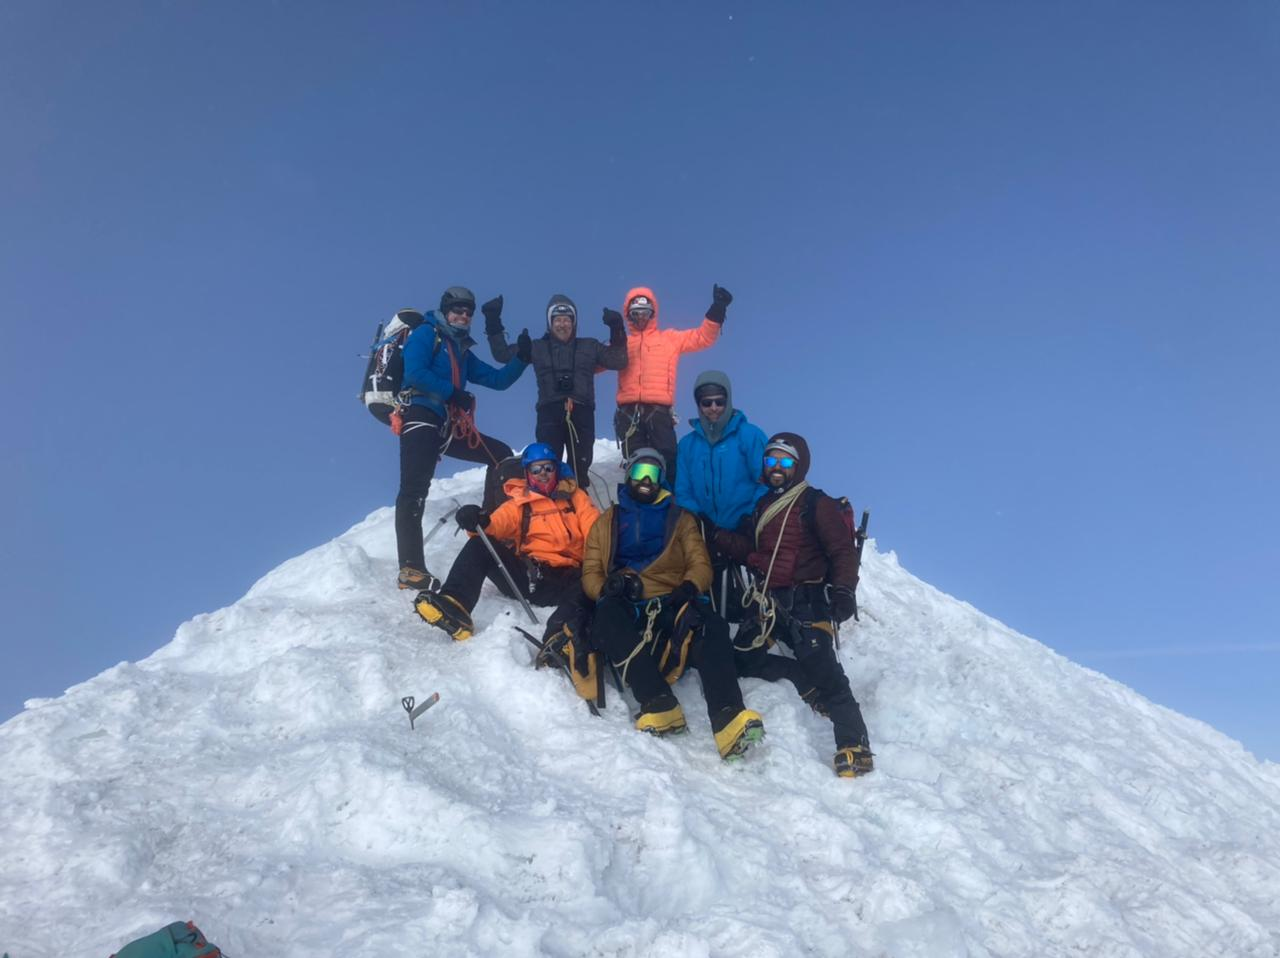 2021 Bolivia Team on Huayna Potosi Summit (Fabricio Gomez)